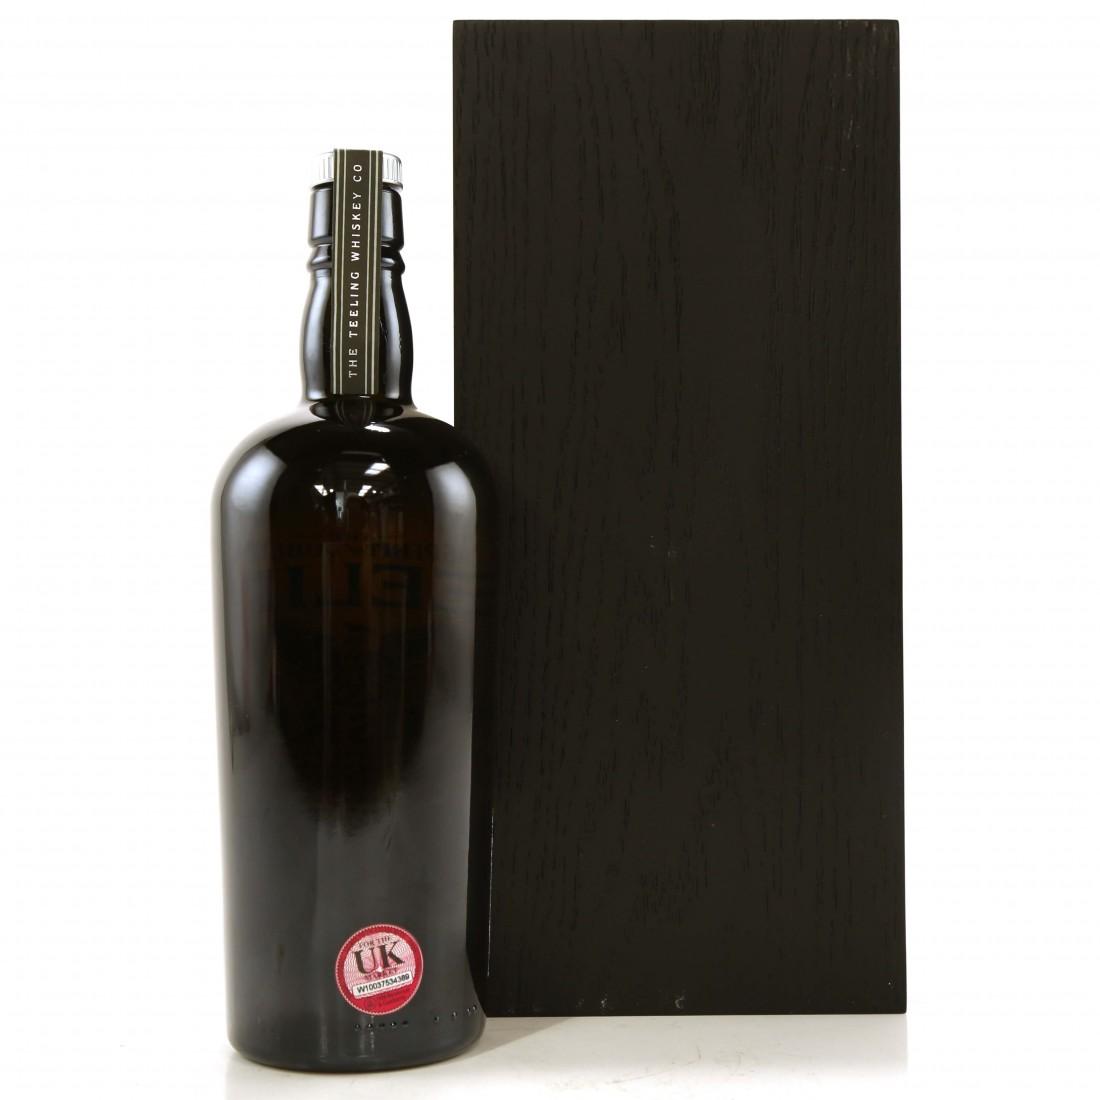 Teeling Celebratory Single Pot Still Whiskey / Bottle #005